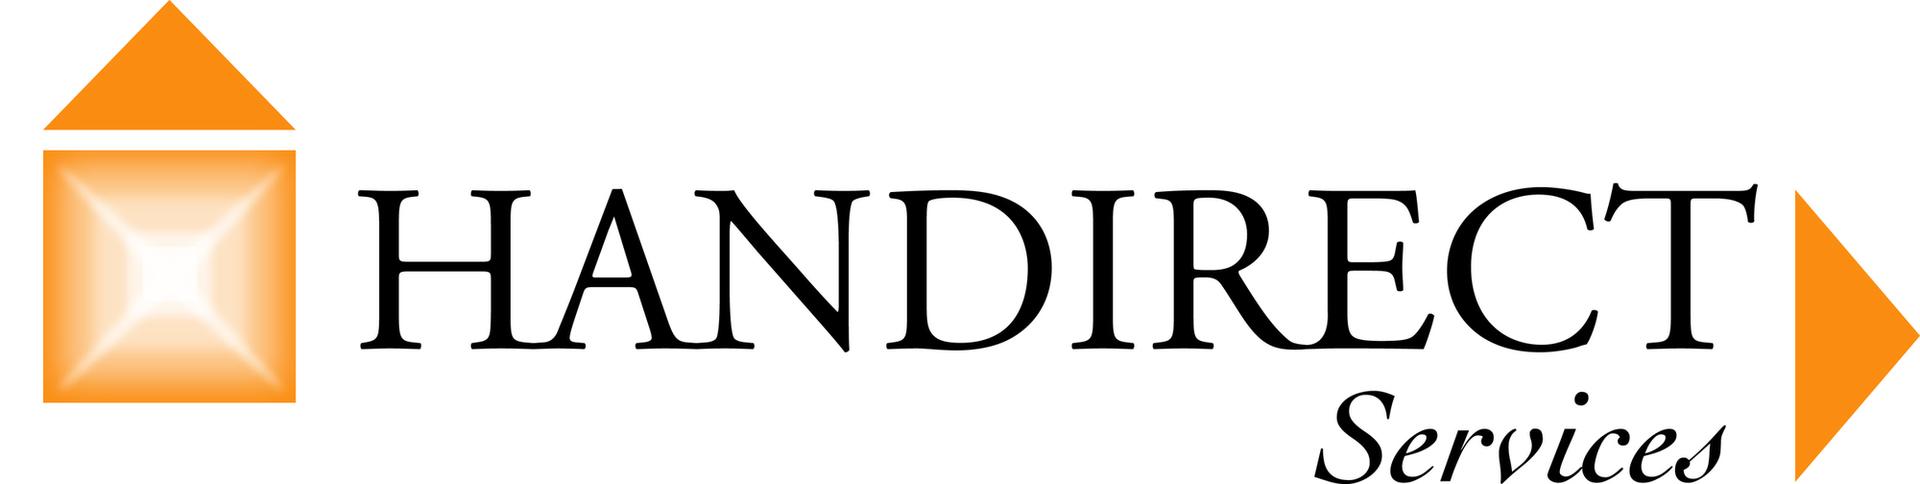 Logo Handirect Services